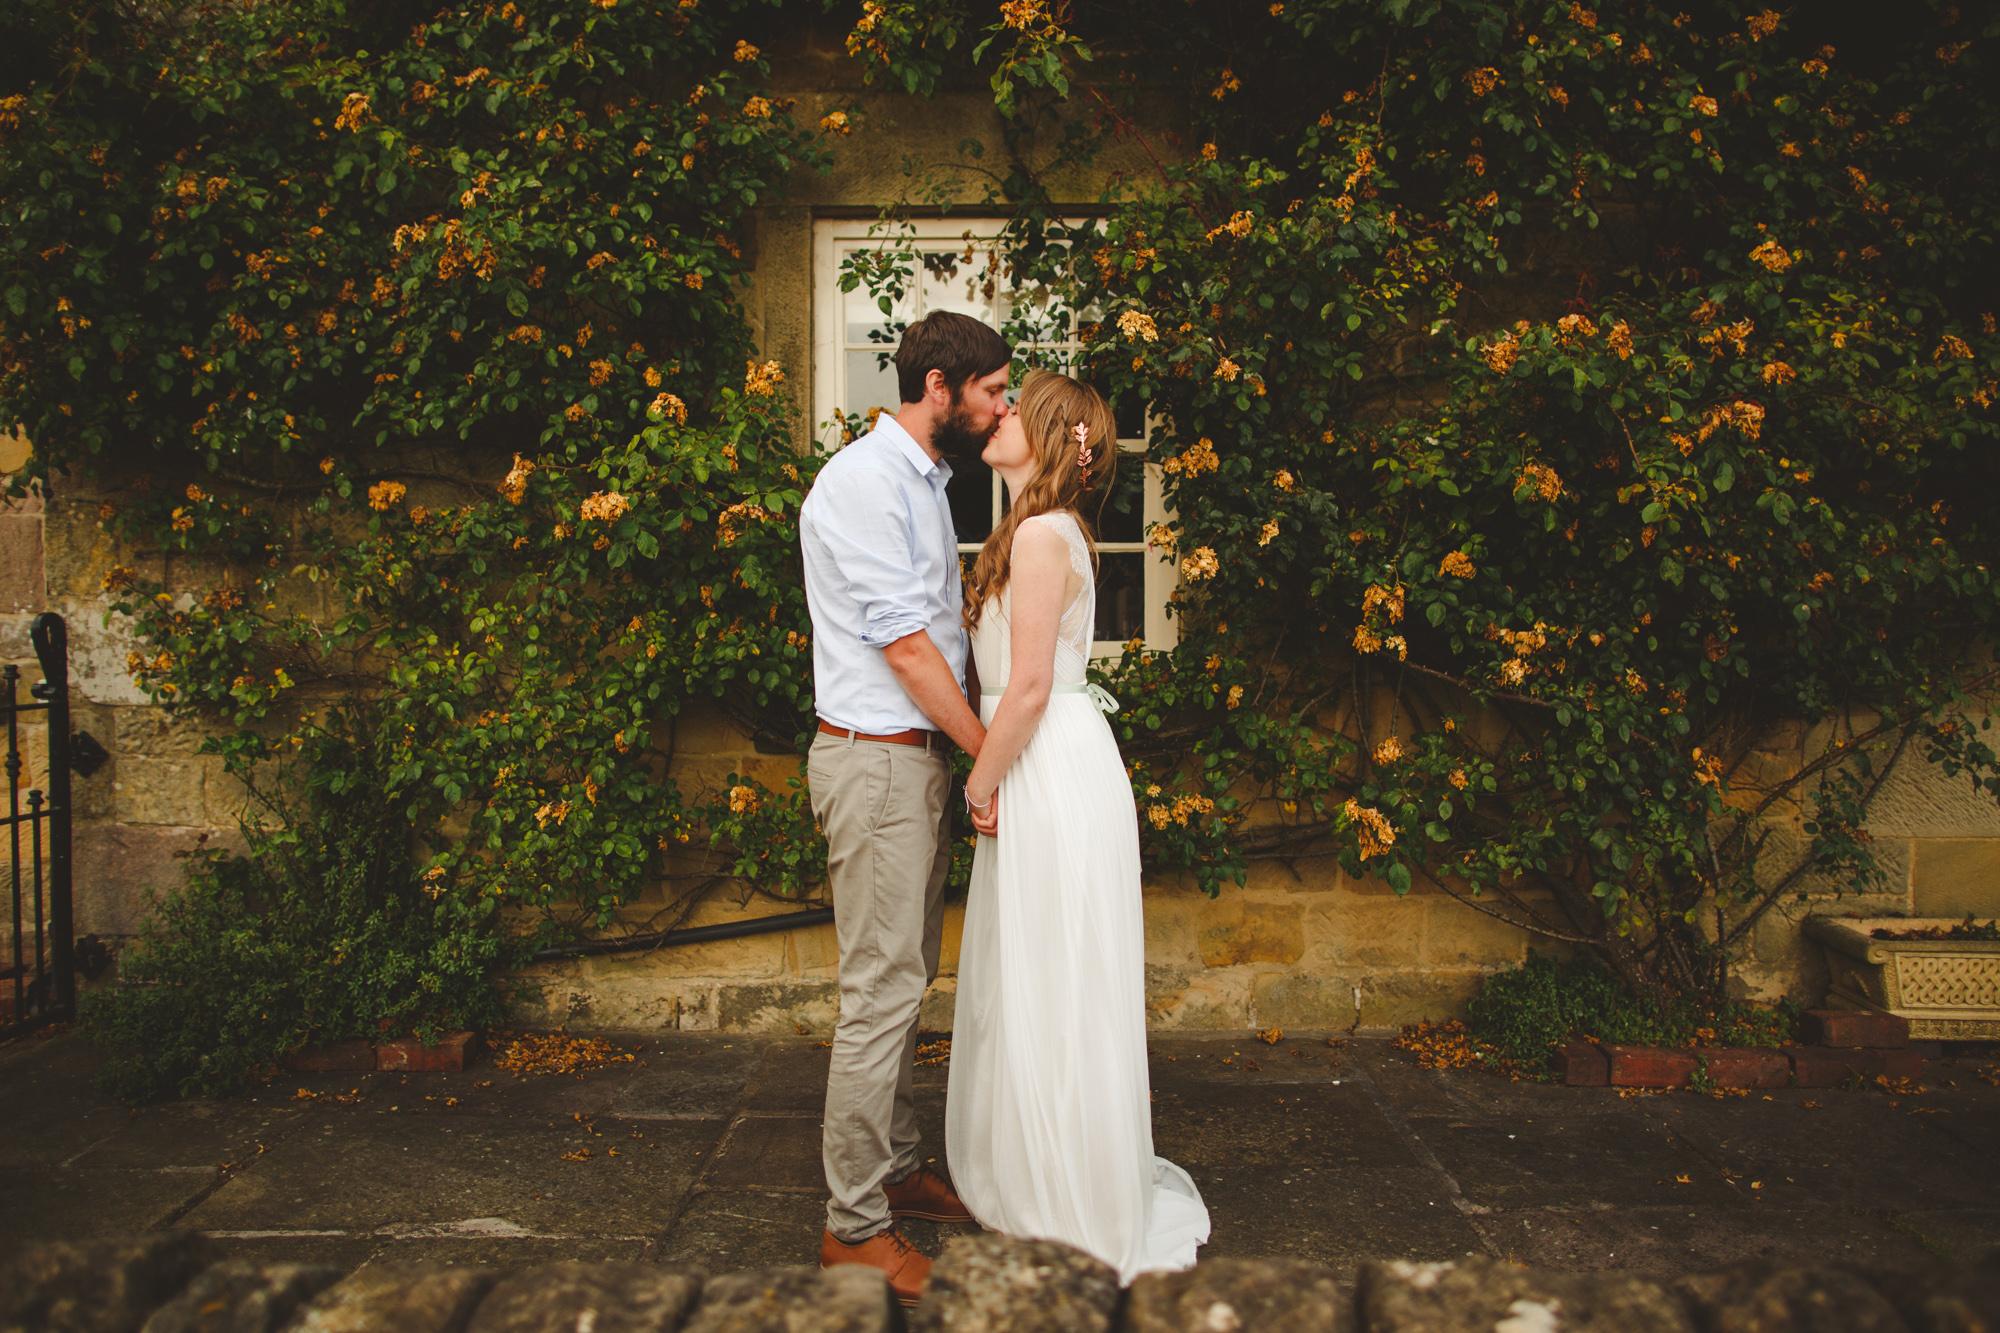 derbyshire-wedding-photographer-filmmaker-carsington-water--17.jpg